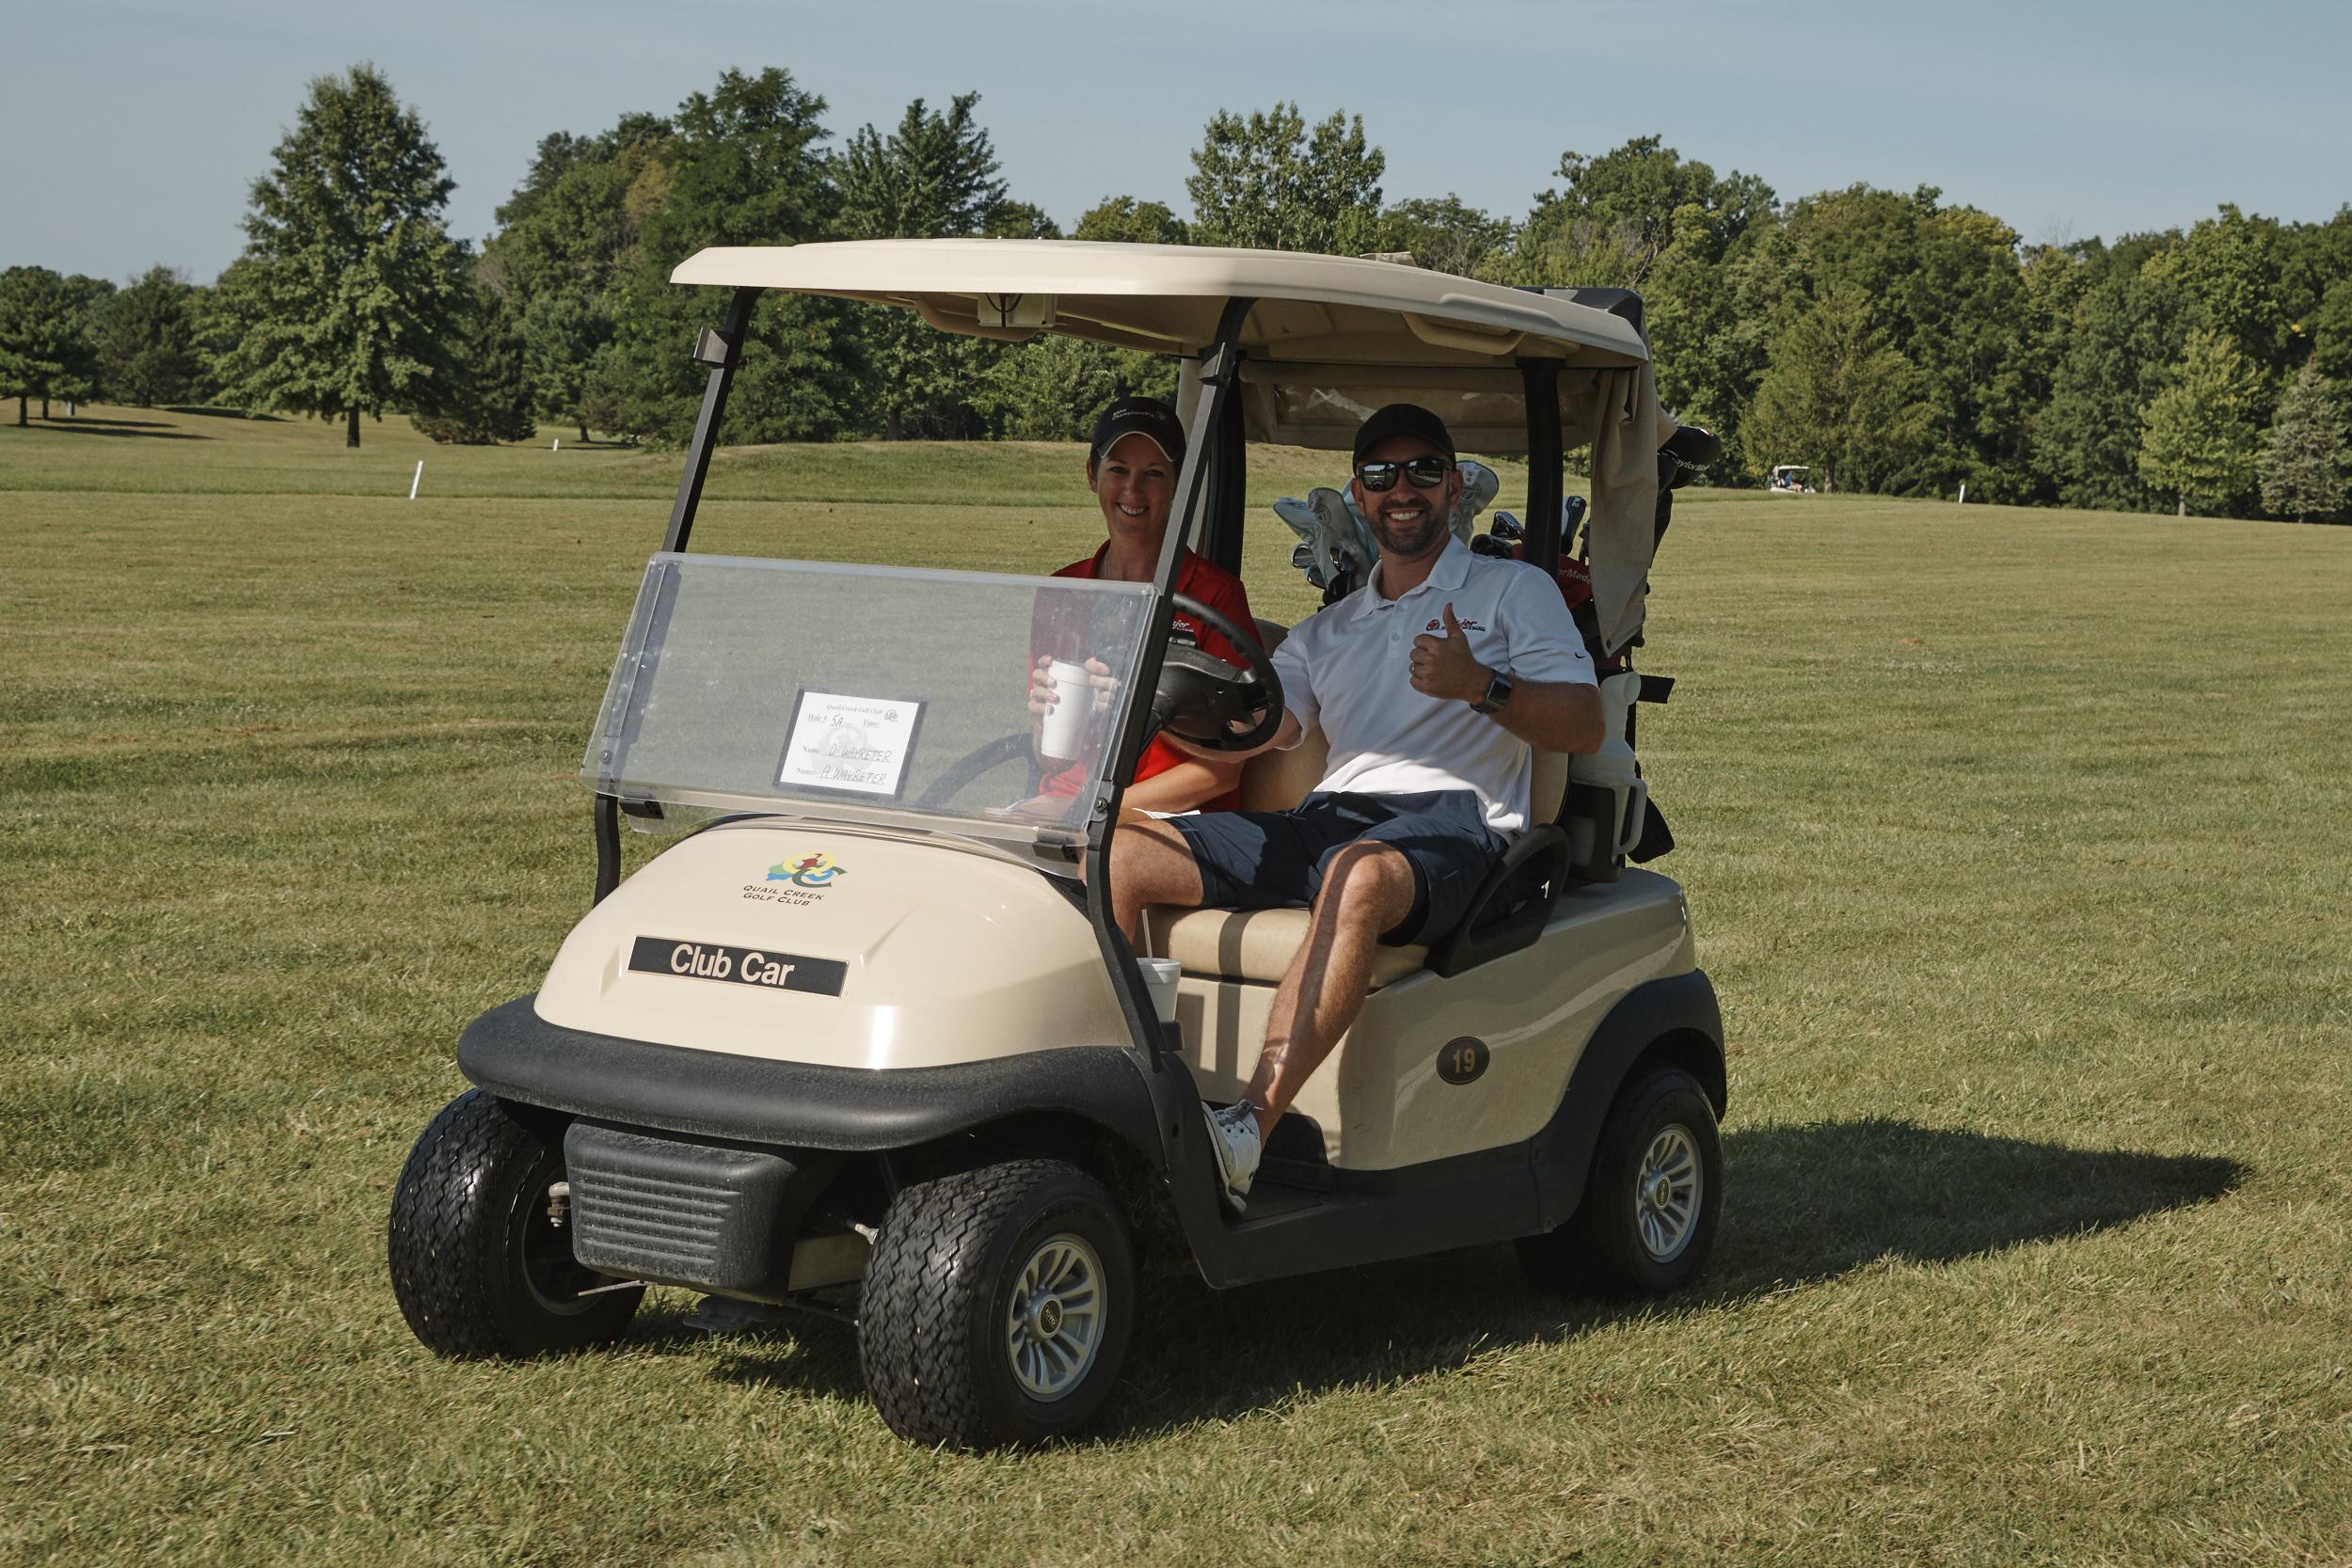 20180728 MTM Golf Outing - Tim Schumm Photography 009.jpg